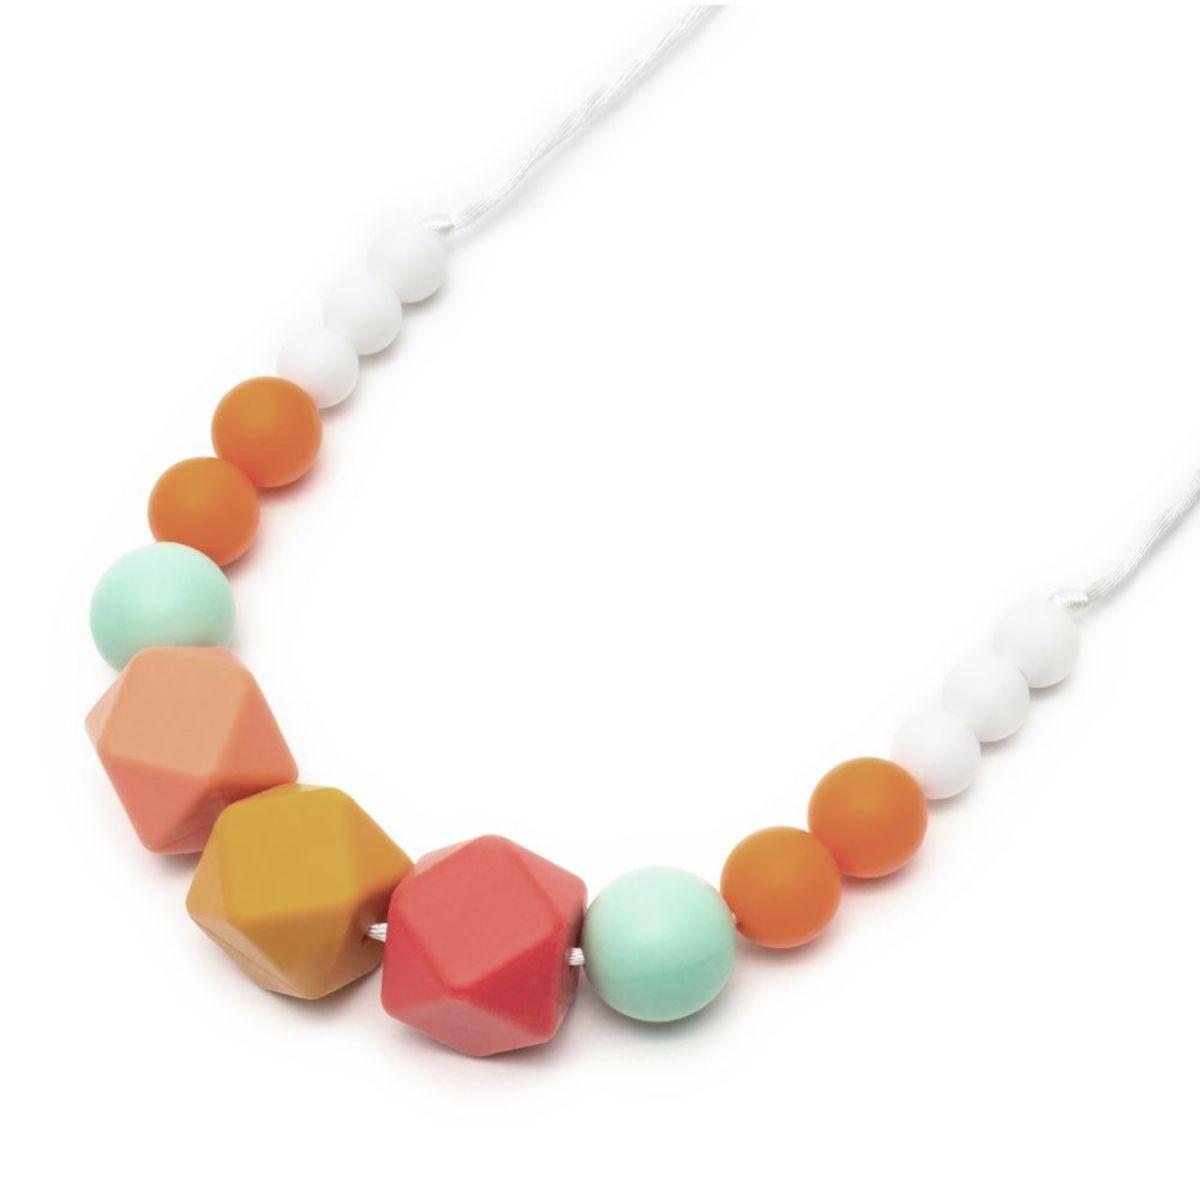 Silikónové dojčiace korále Kenzo Silicone necklace